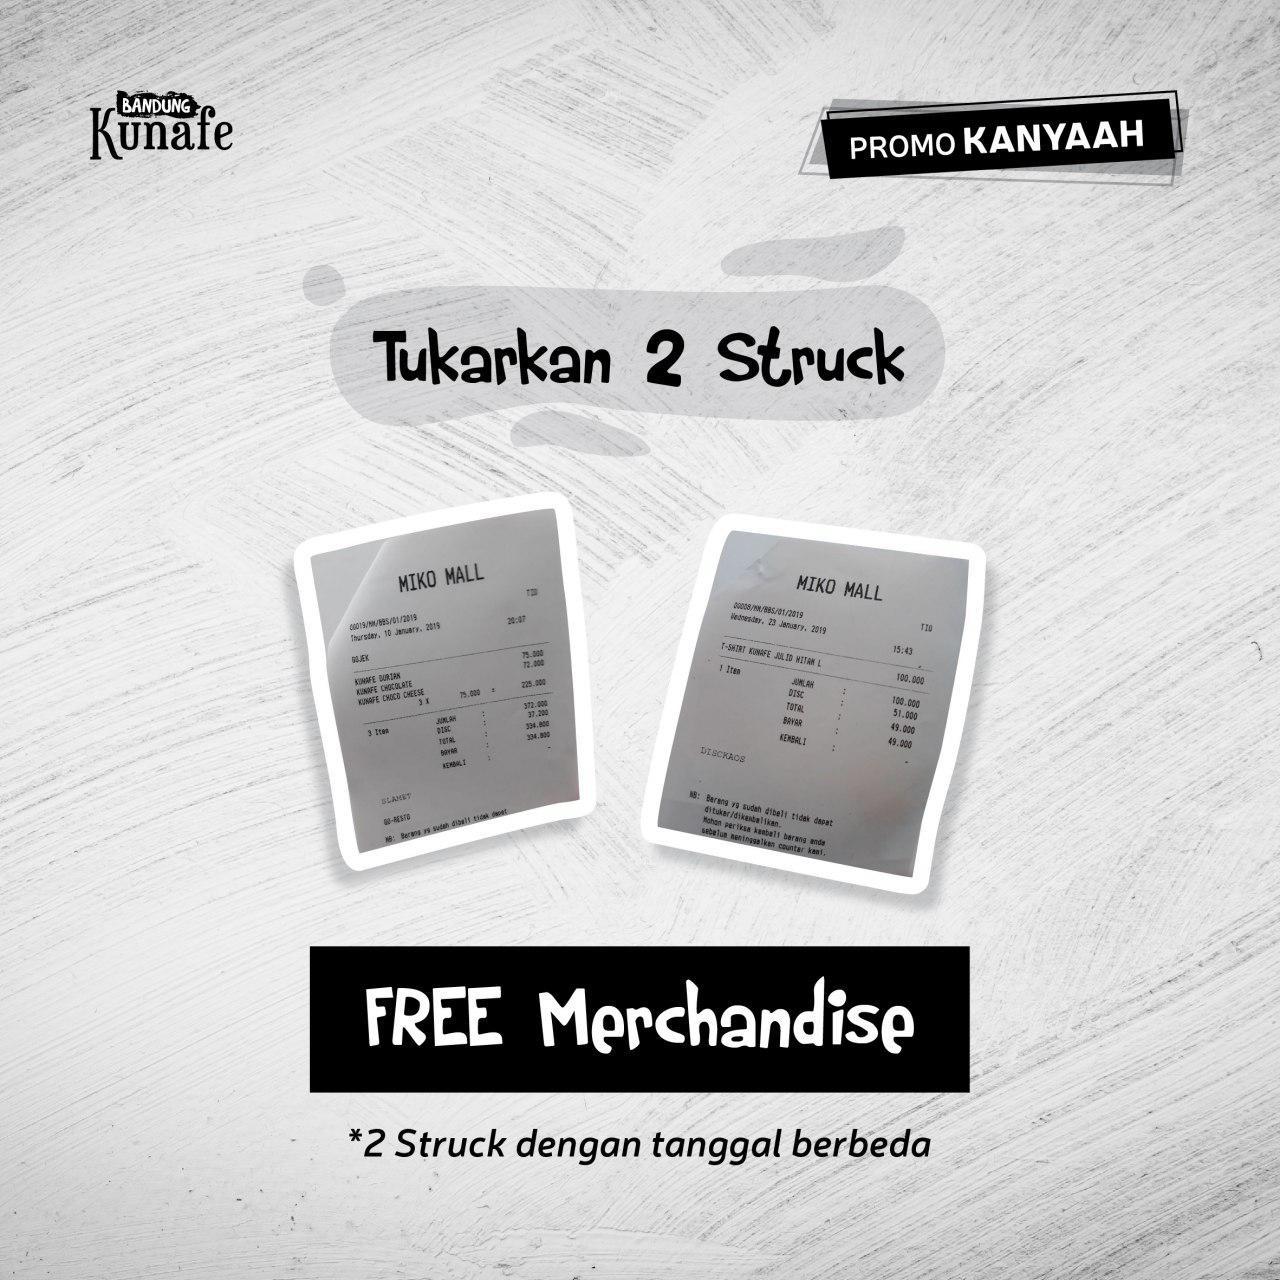 promo kanyaah free merchandise